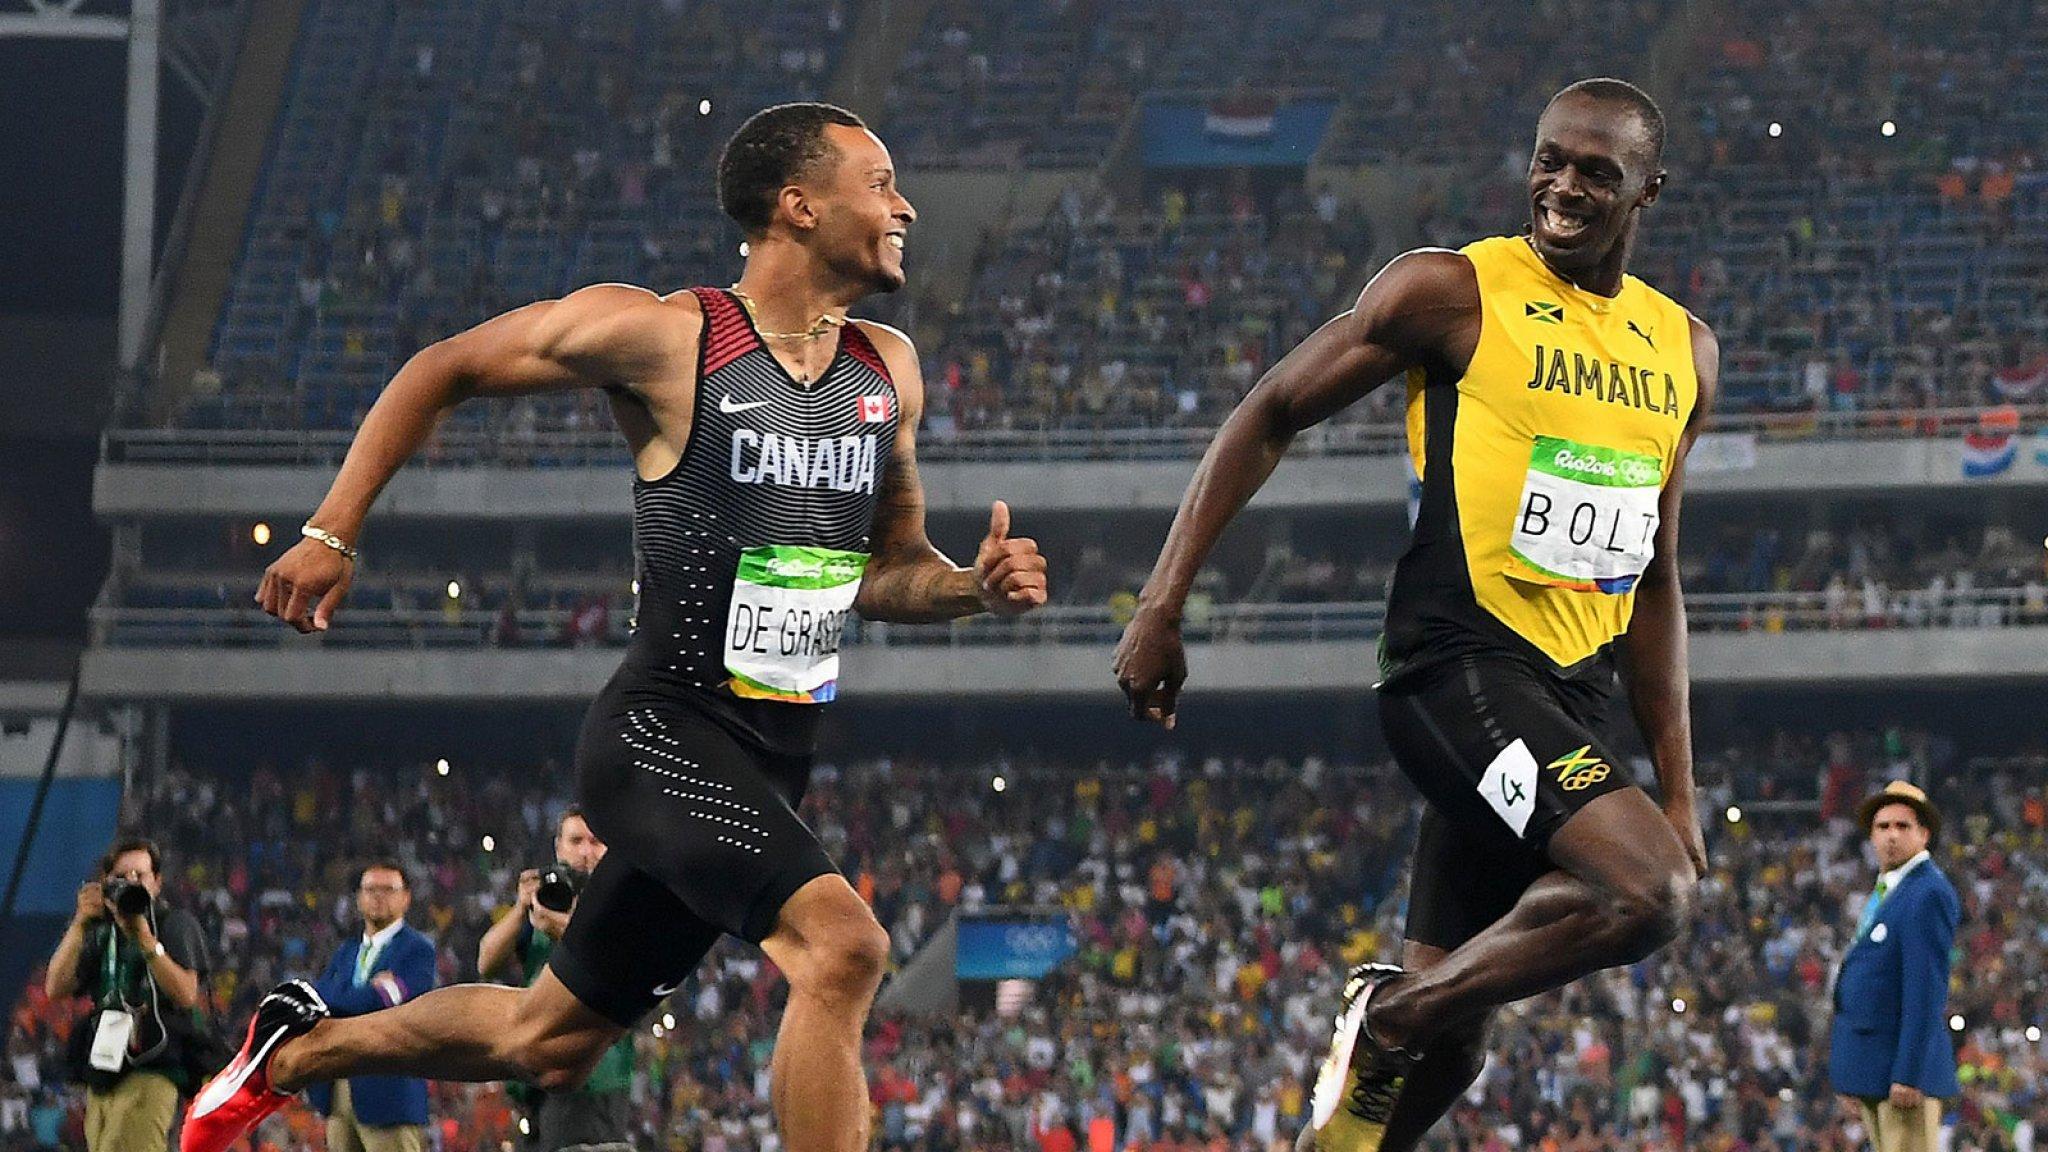 Legendary sprinter Usain Bolt tests positive for COVID-19